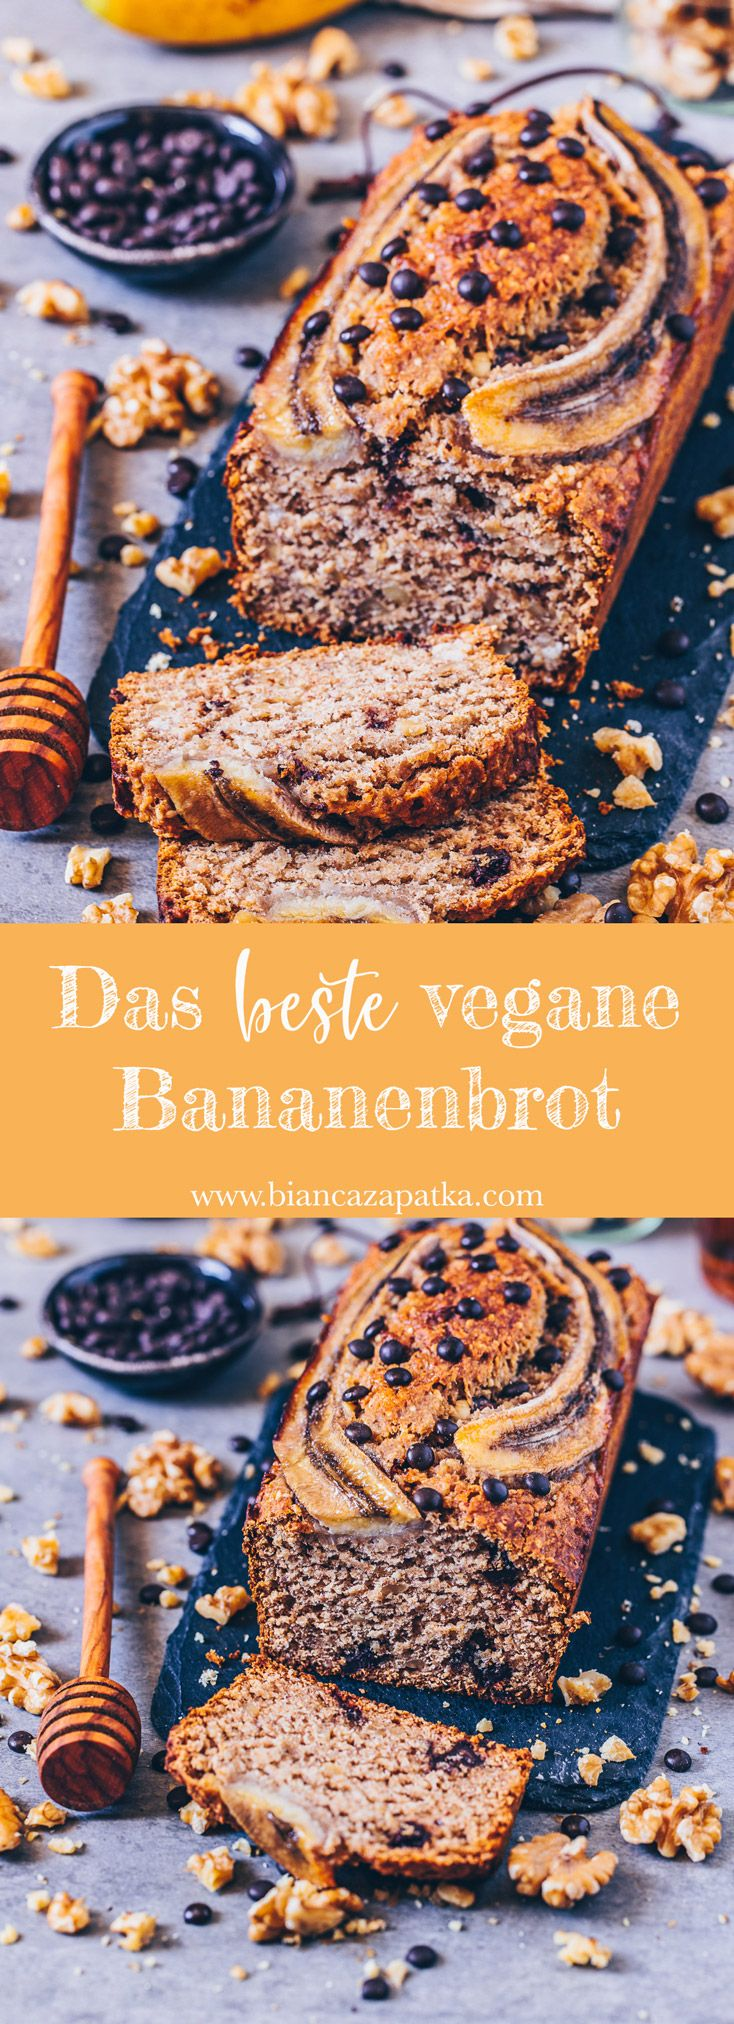 Das beste vegane Bananenbrot - Bianca Zapatka | Rezepte